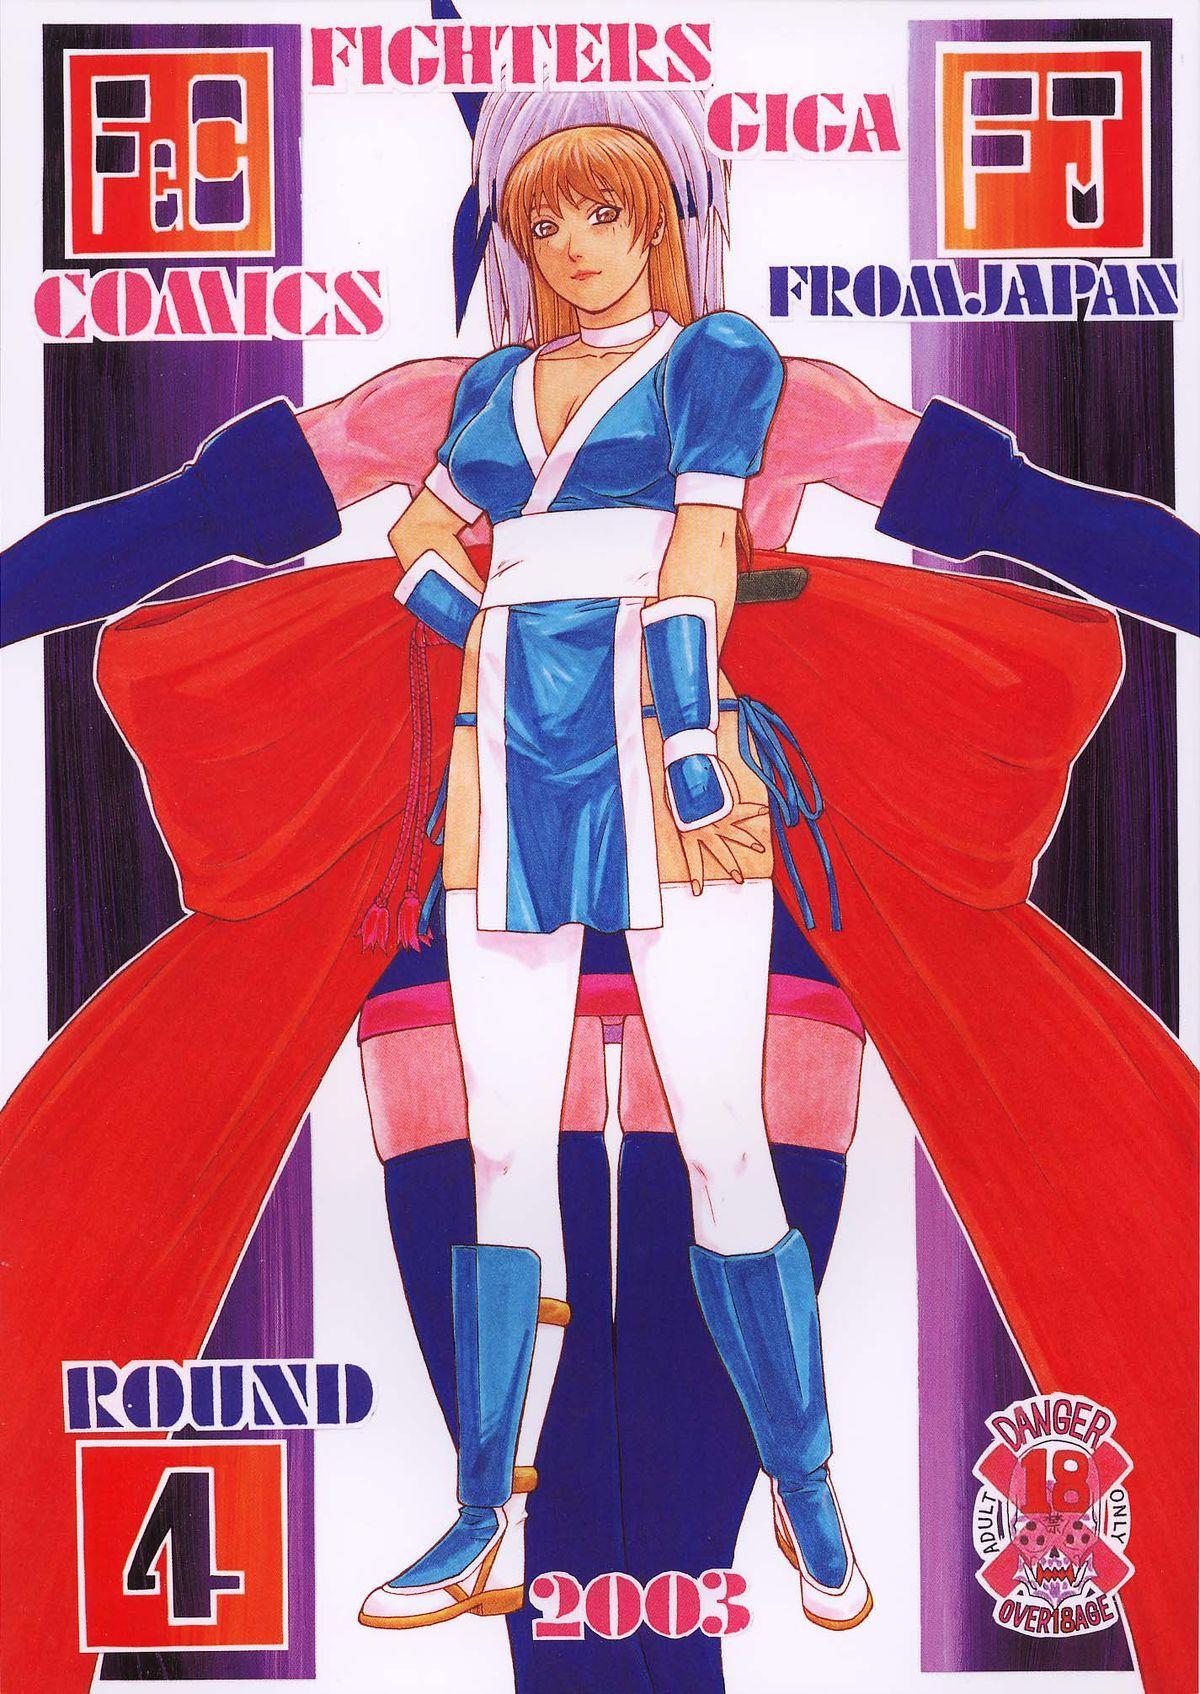 Fighters Giga Comics Round 4 0